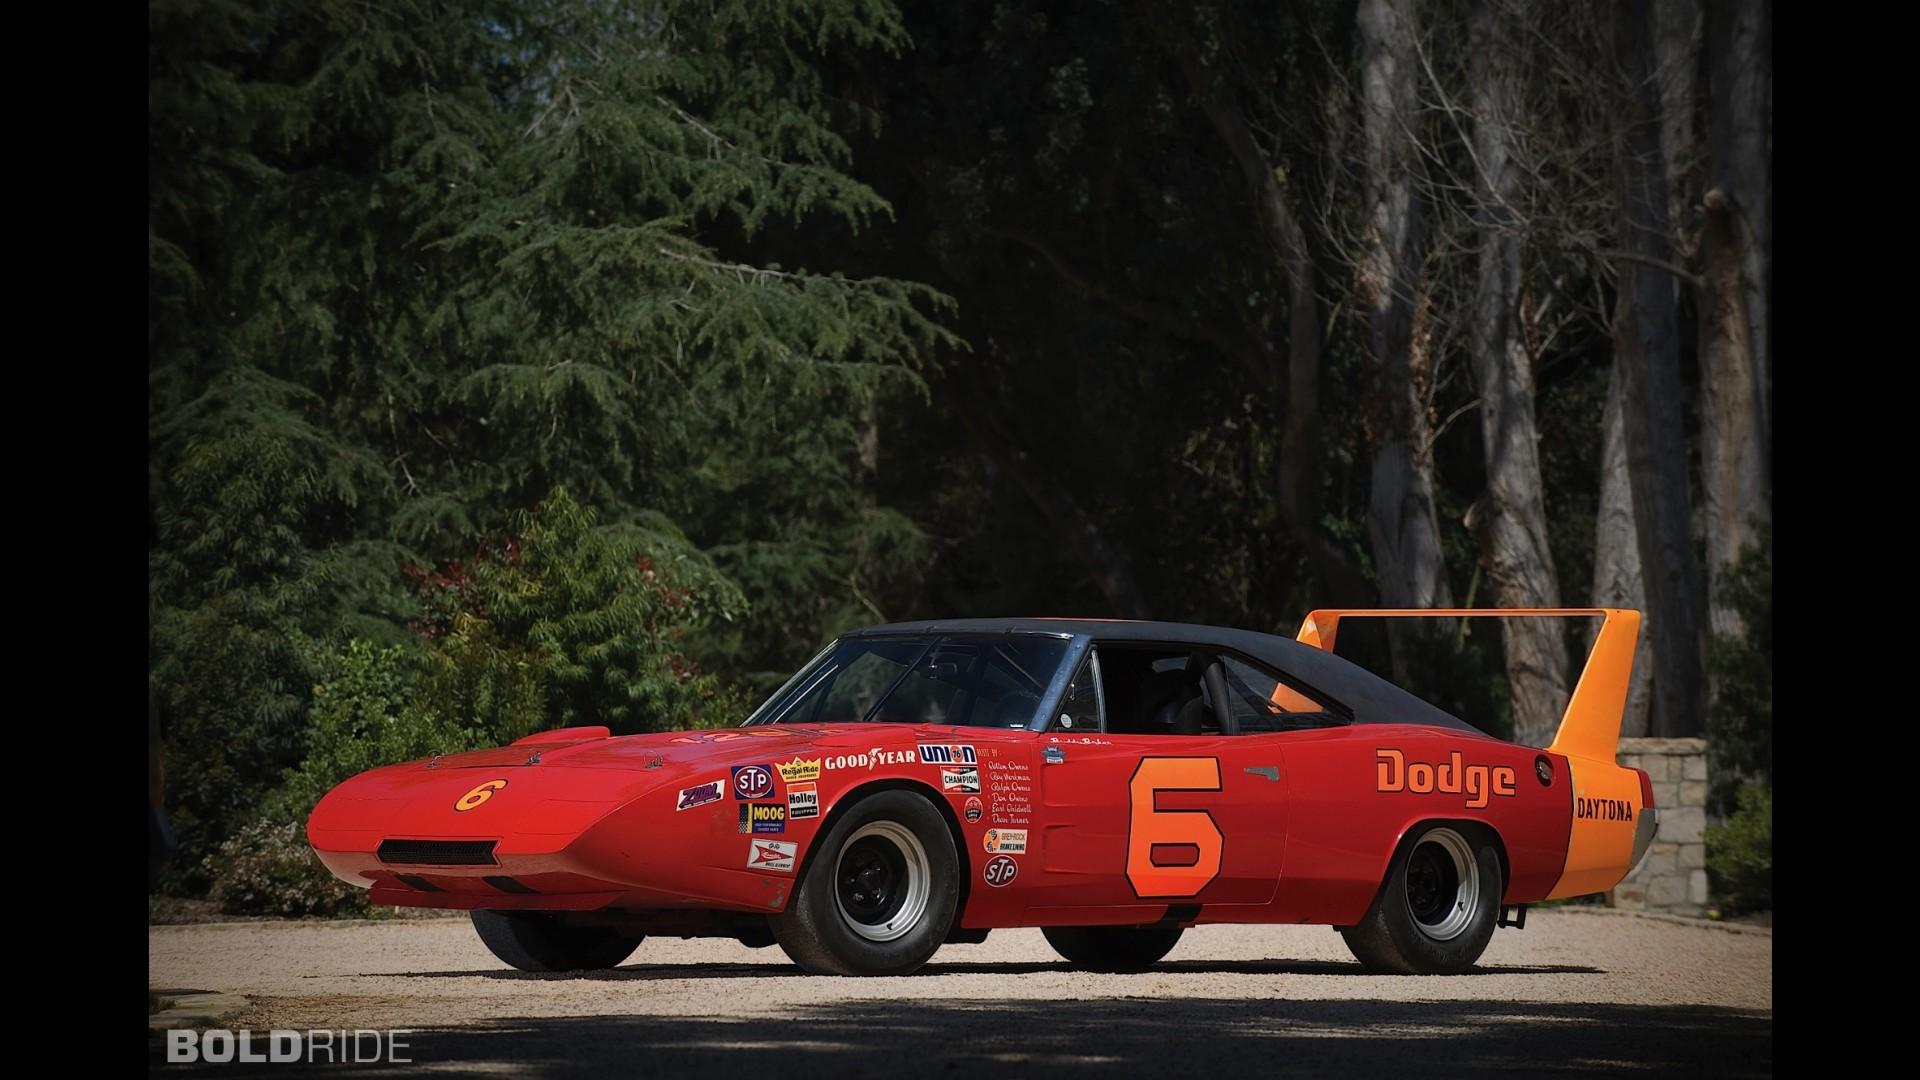 Dodge Charger Games >> Dodge Charger Daytona Cotton Owens